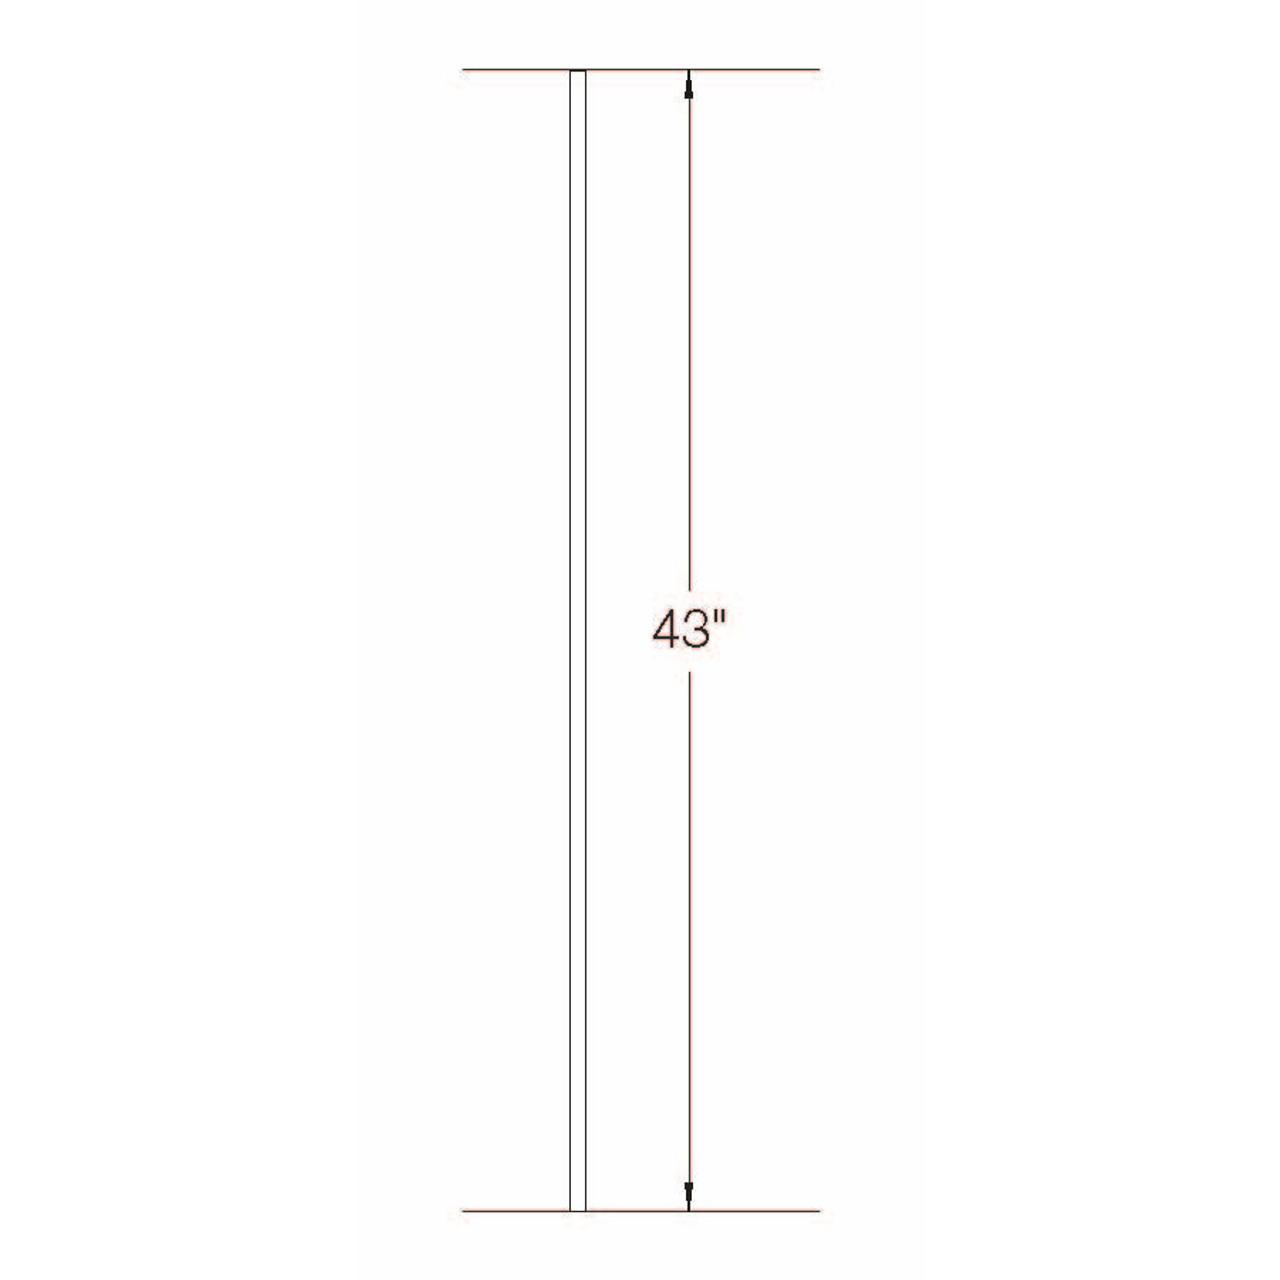 2GR01 16mm Round Plain Bar, Tubular Steel Dimensional Information